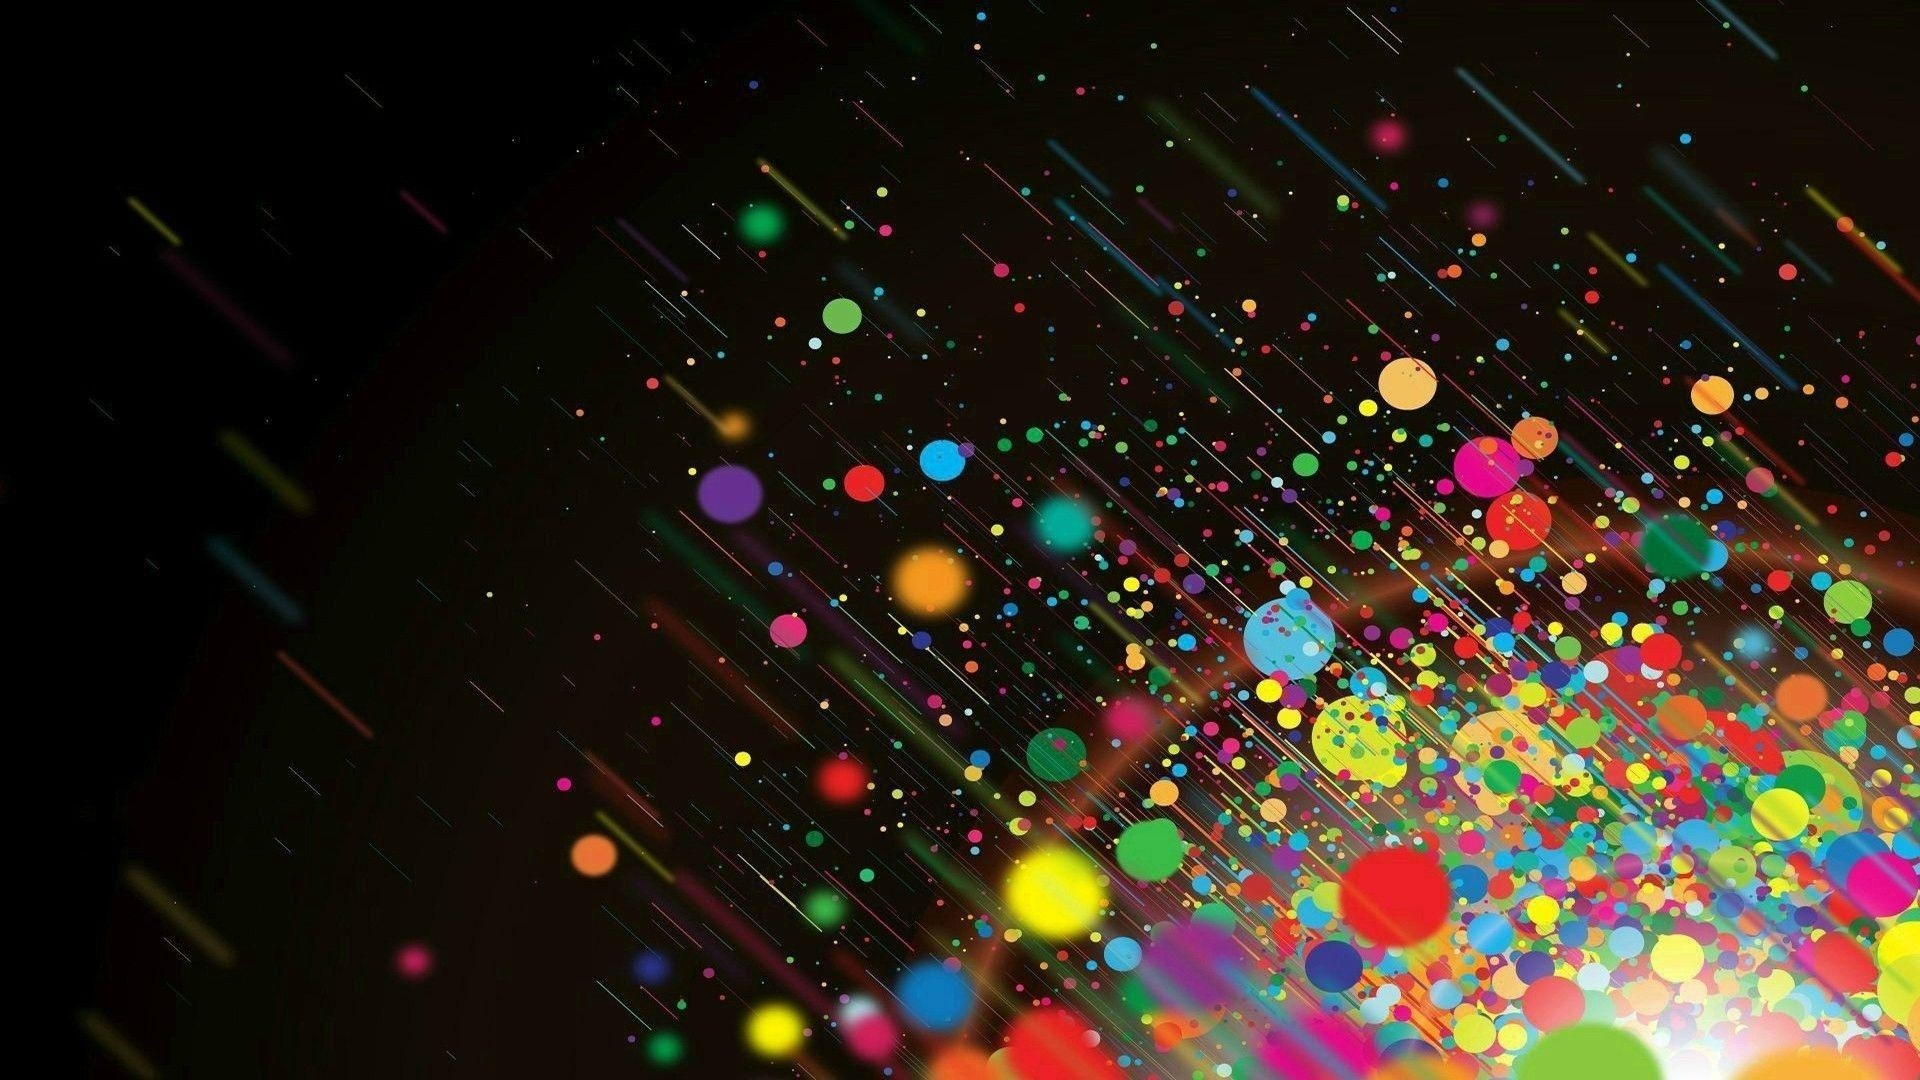 Colorful Abstract Desktop Wallpaper